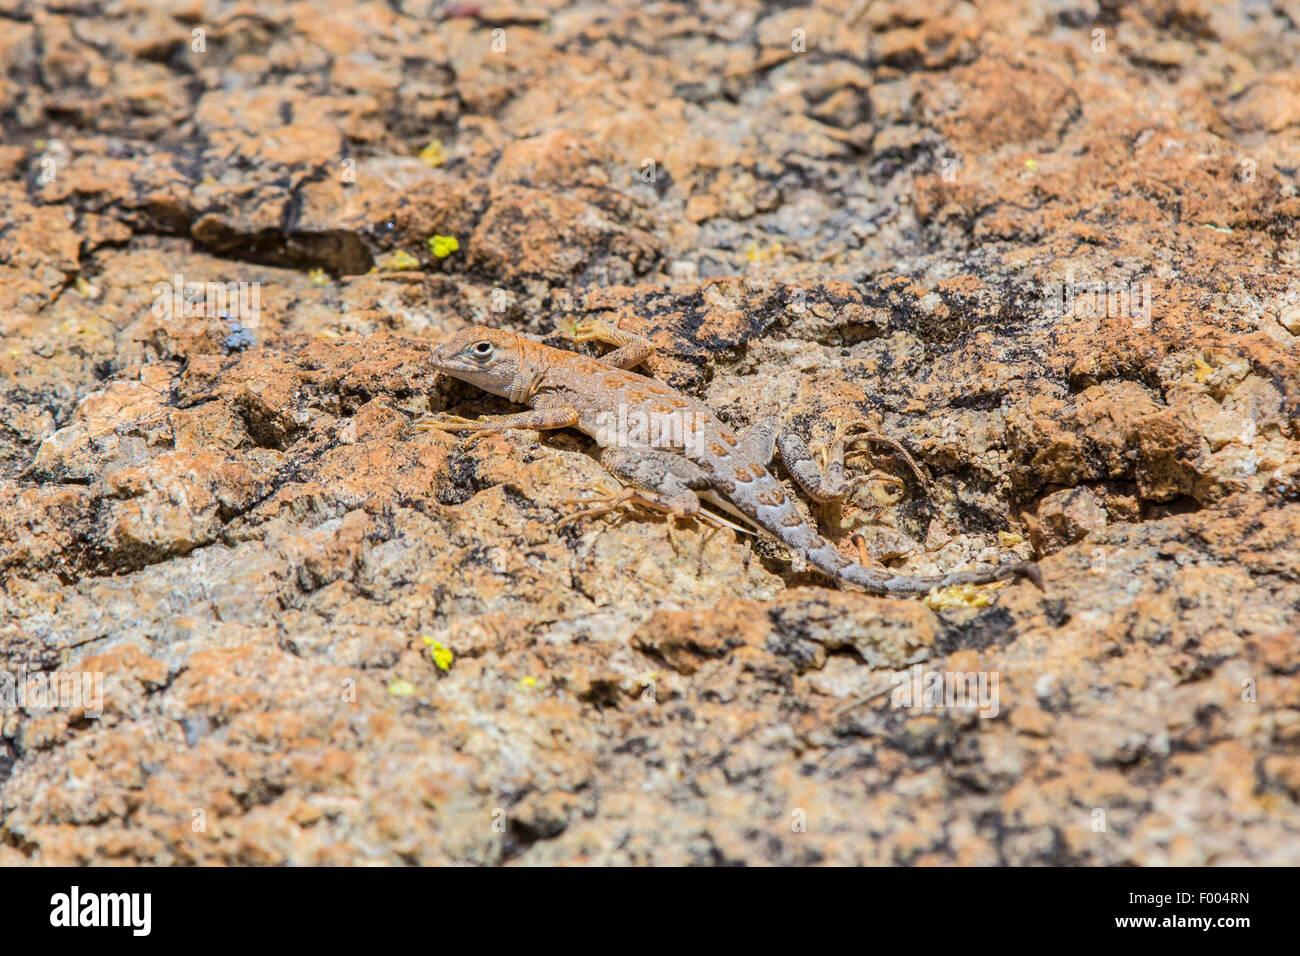 Elegante Earless Lizard (cfr. Holbrookia elegans), ben mimetizzata su rock, STATI UNITI D'AMERICA, Arizona Immagini Stock